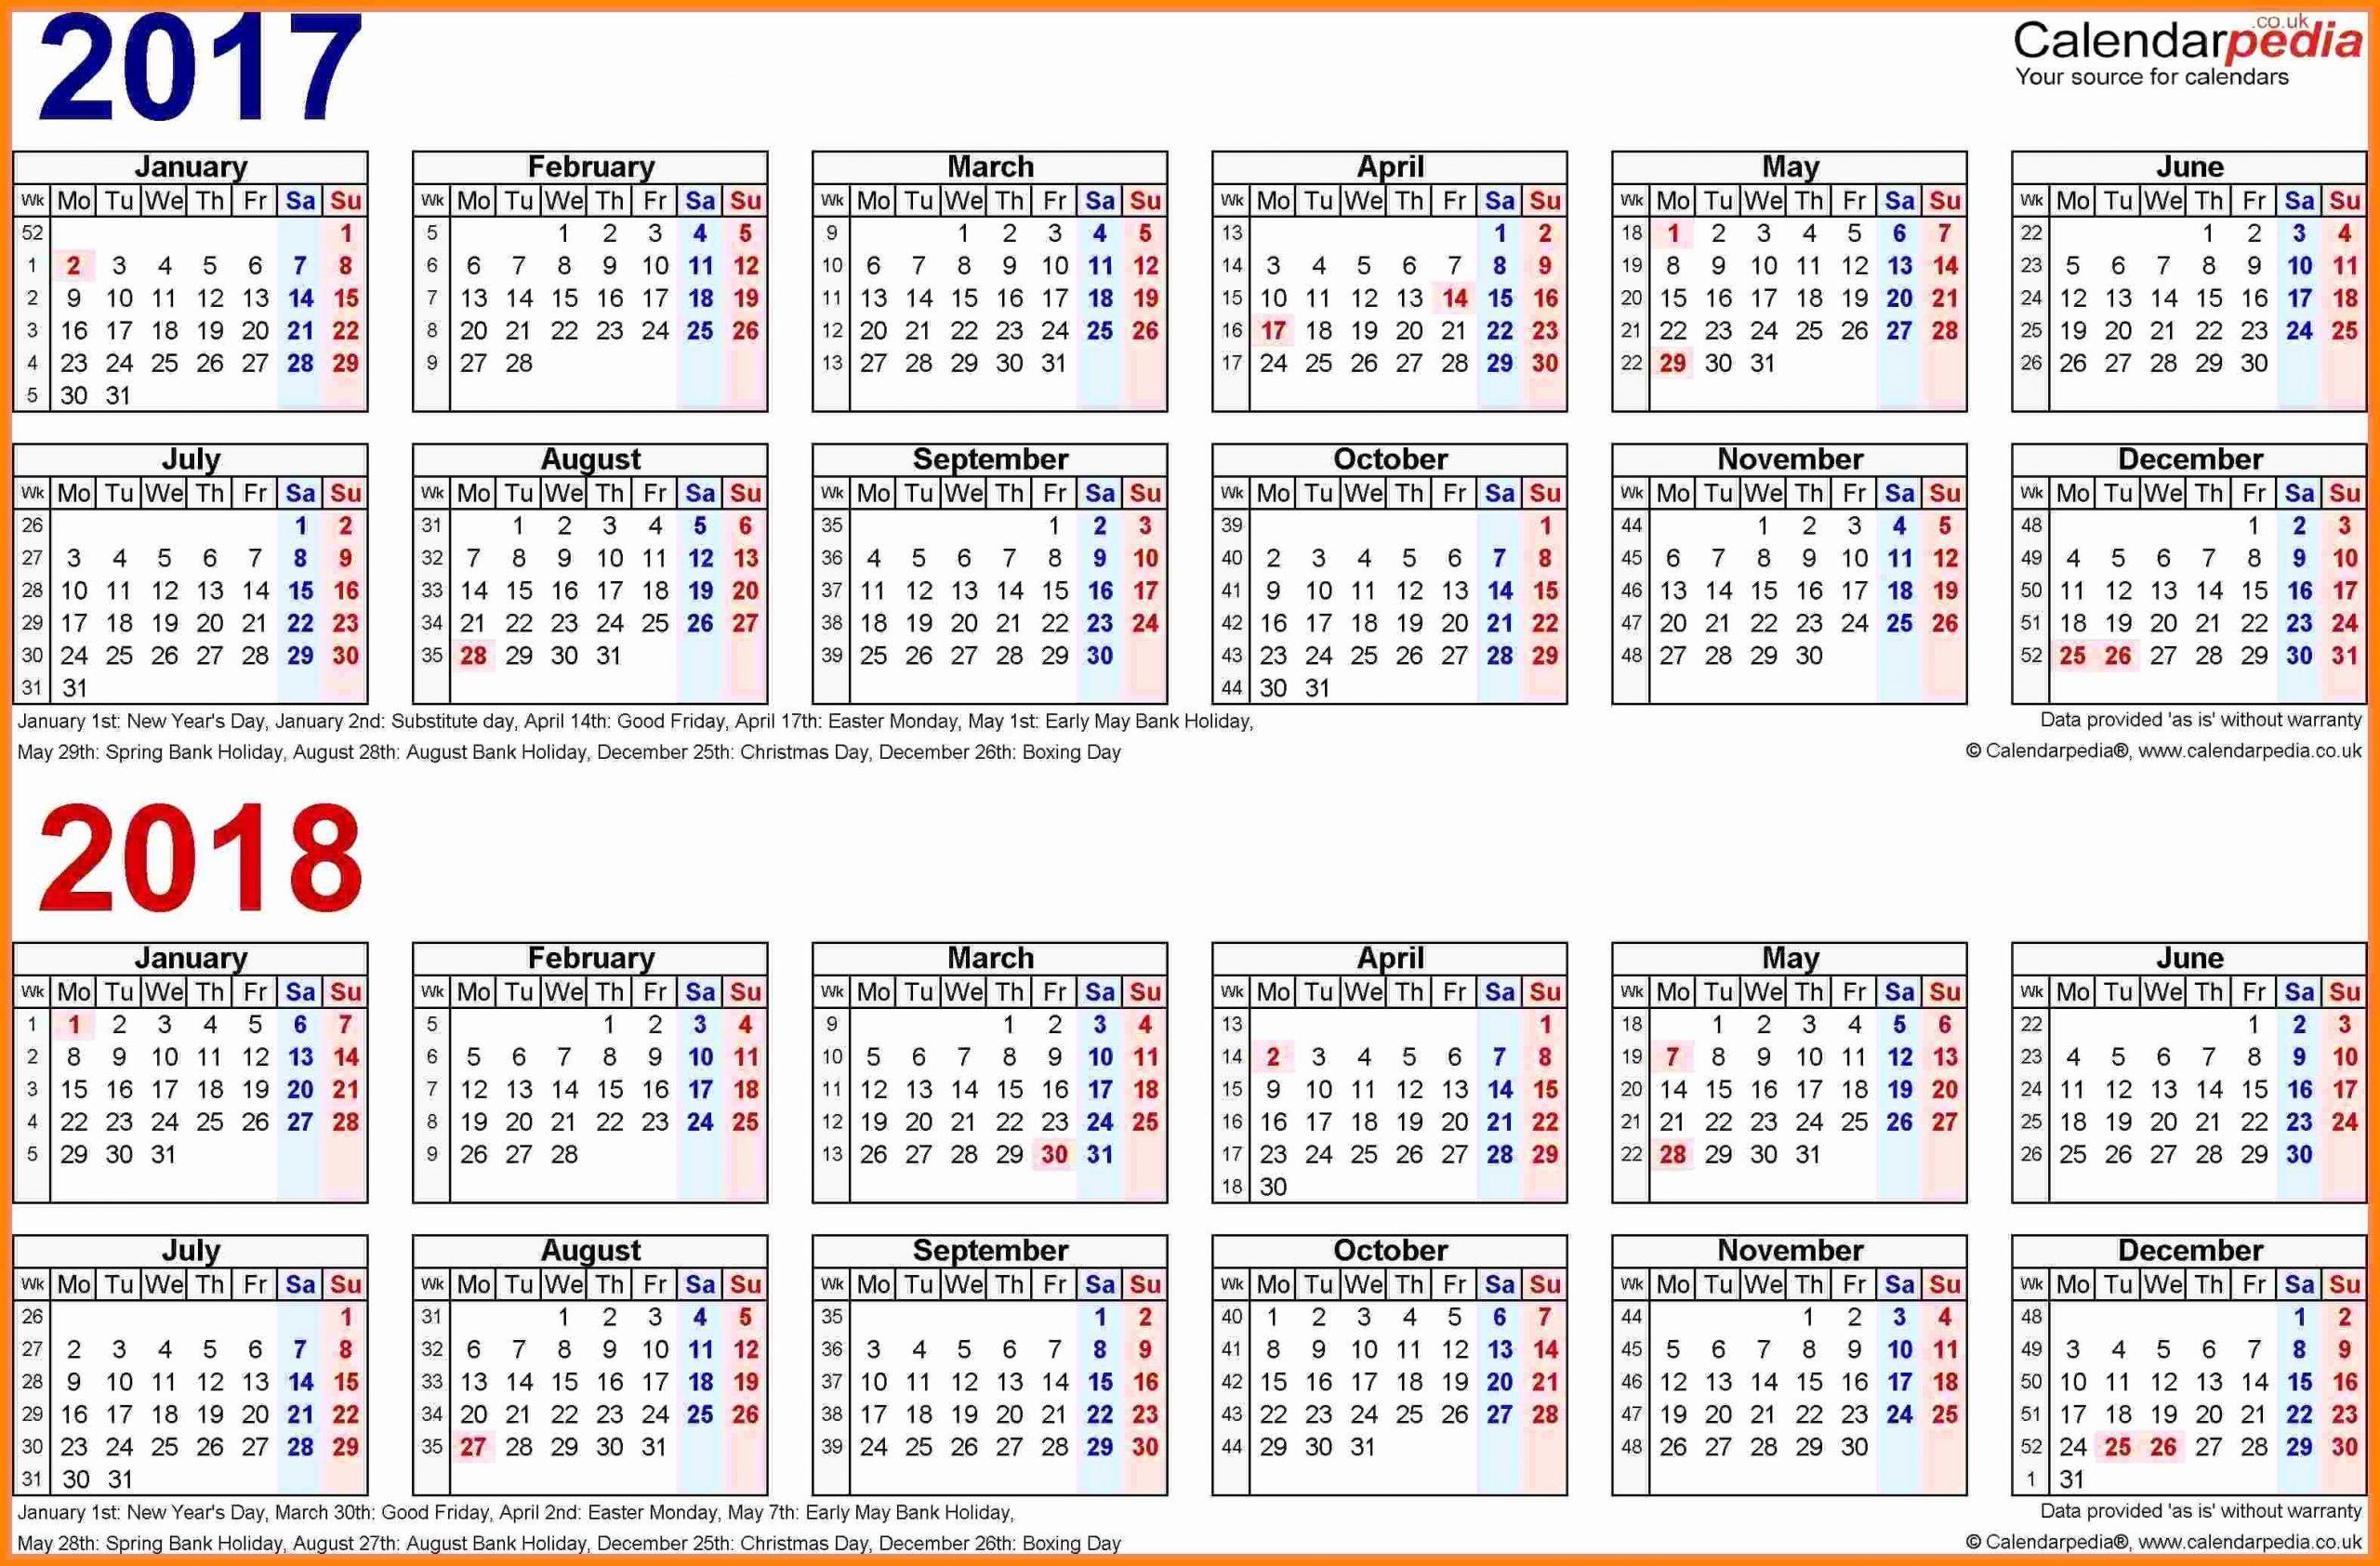 40 Biweekly Pay Schedule Template In 2020 Calendar